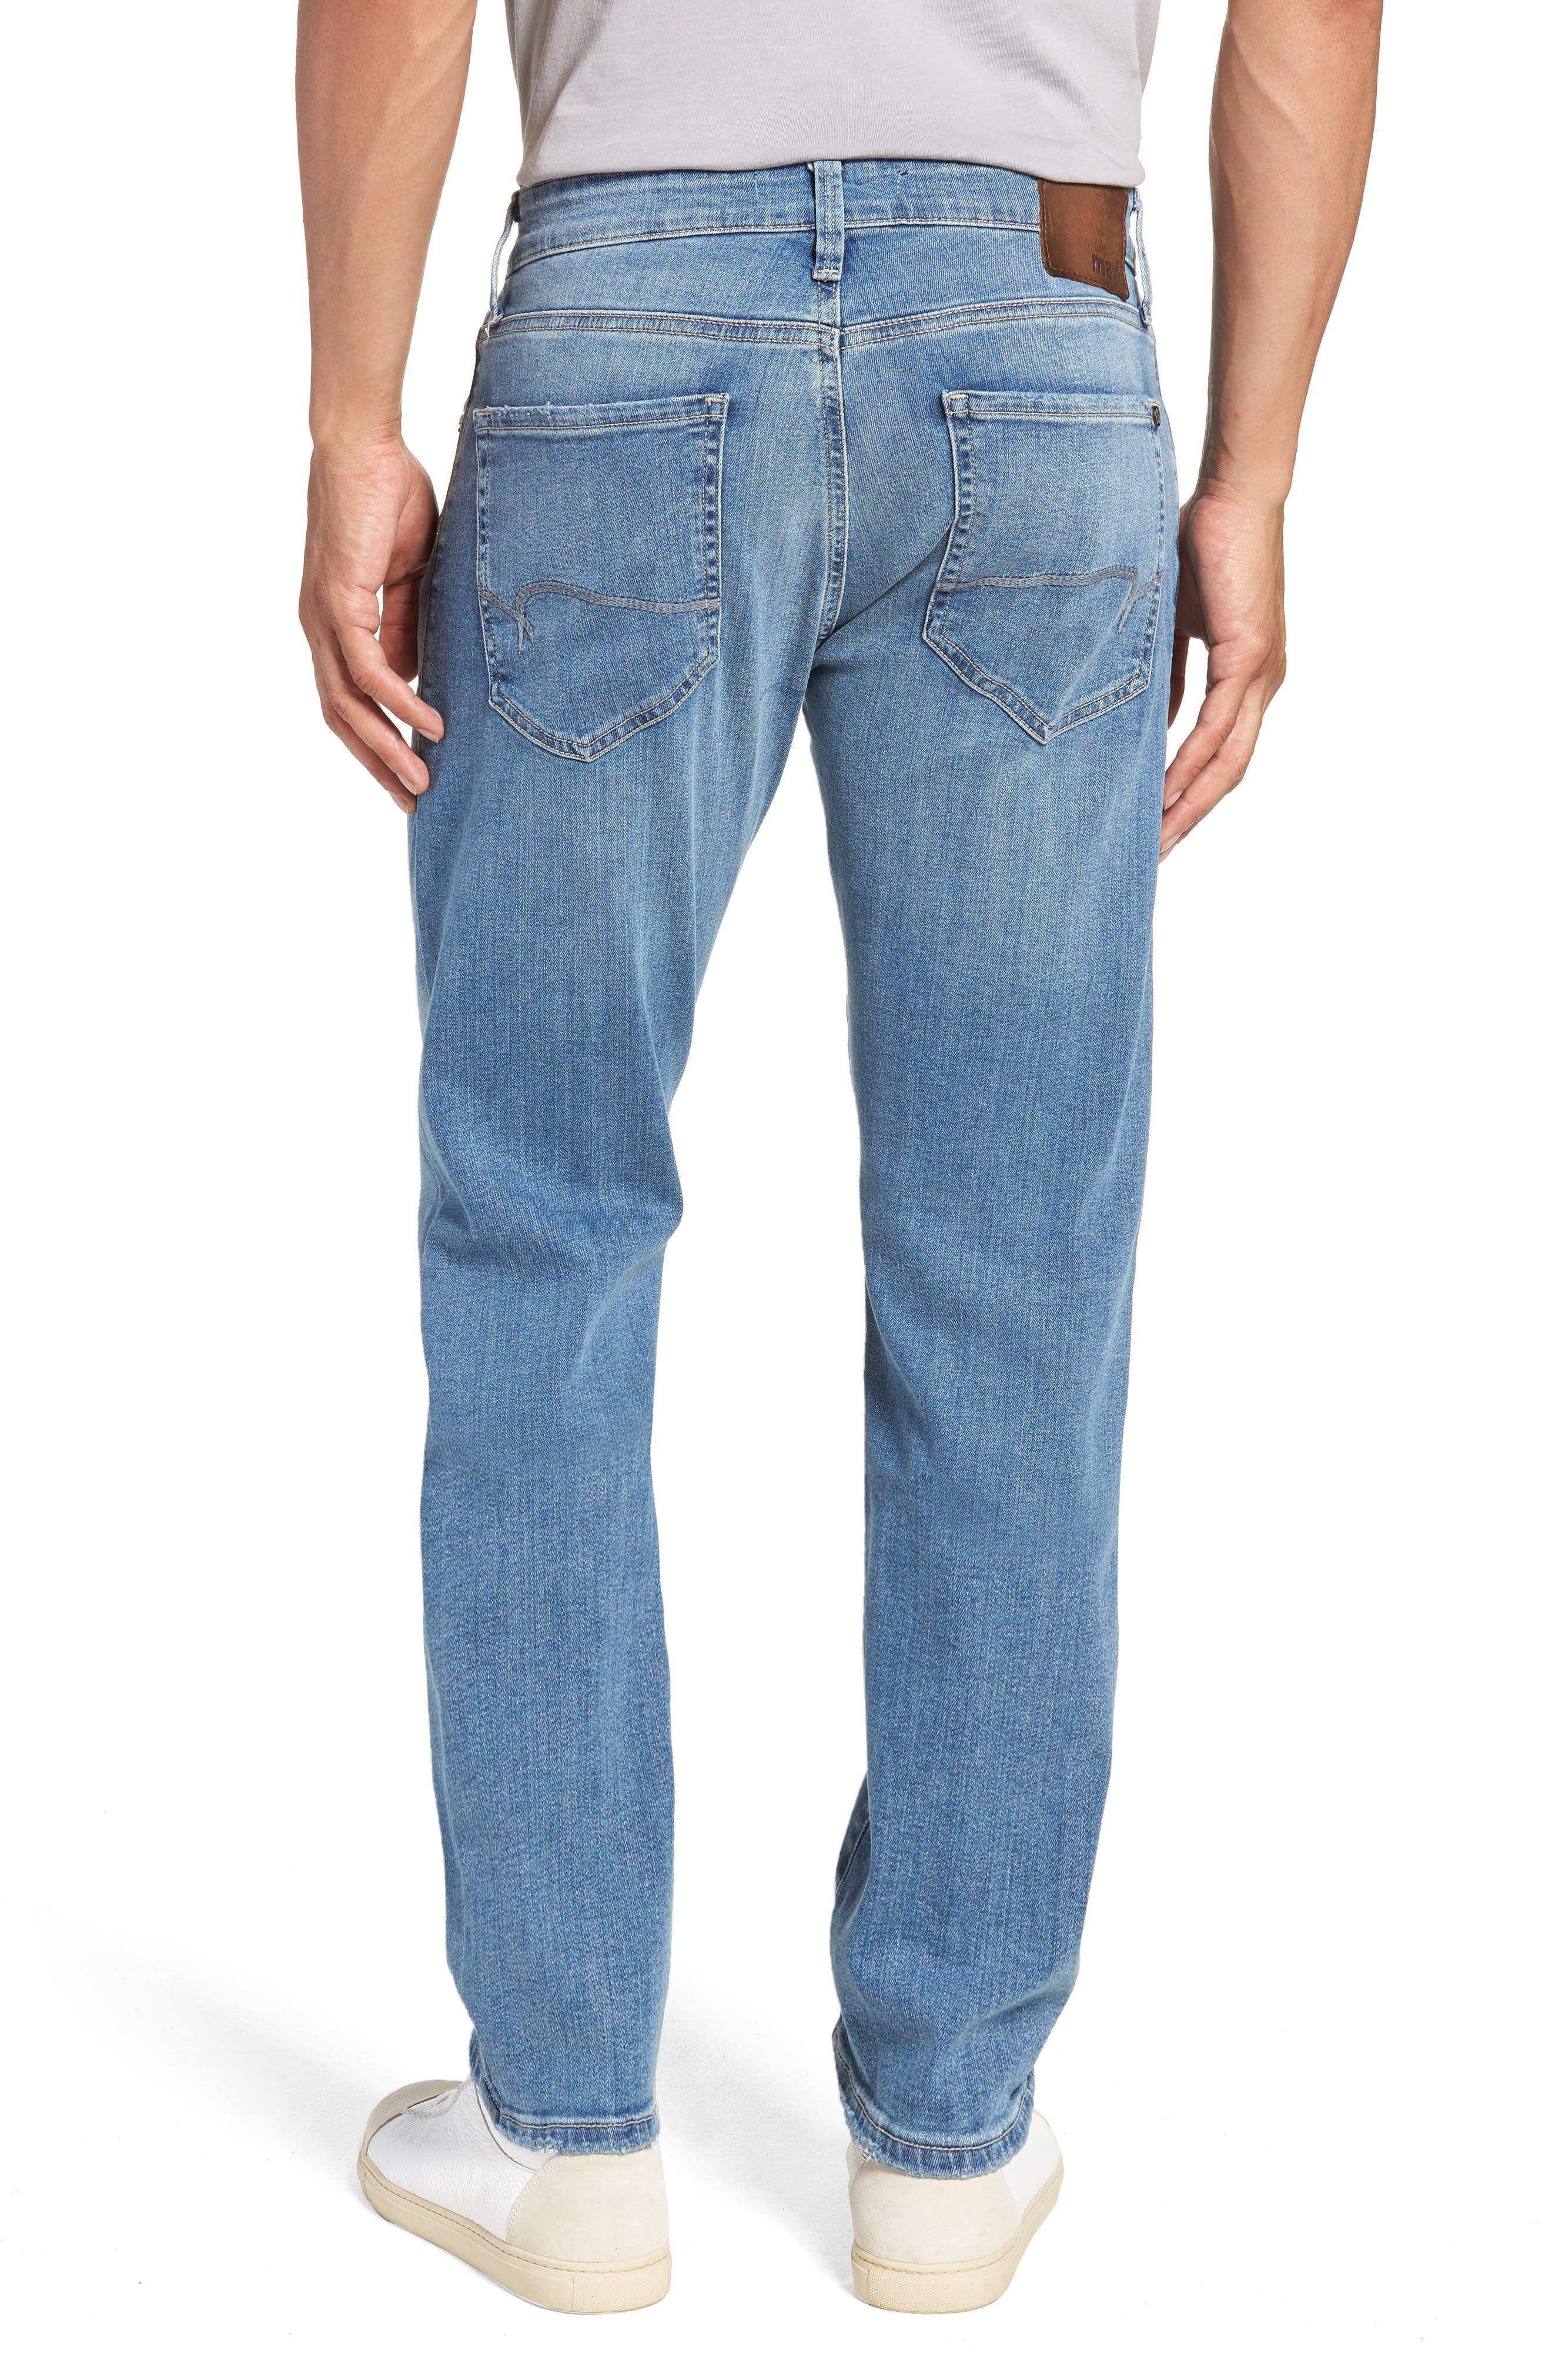 Jake Slim Fit Jeans,                             Alternate thumbnail 2, color,